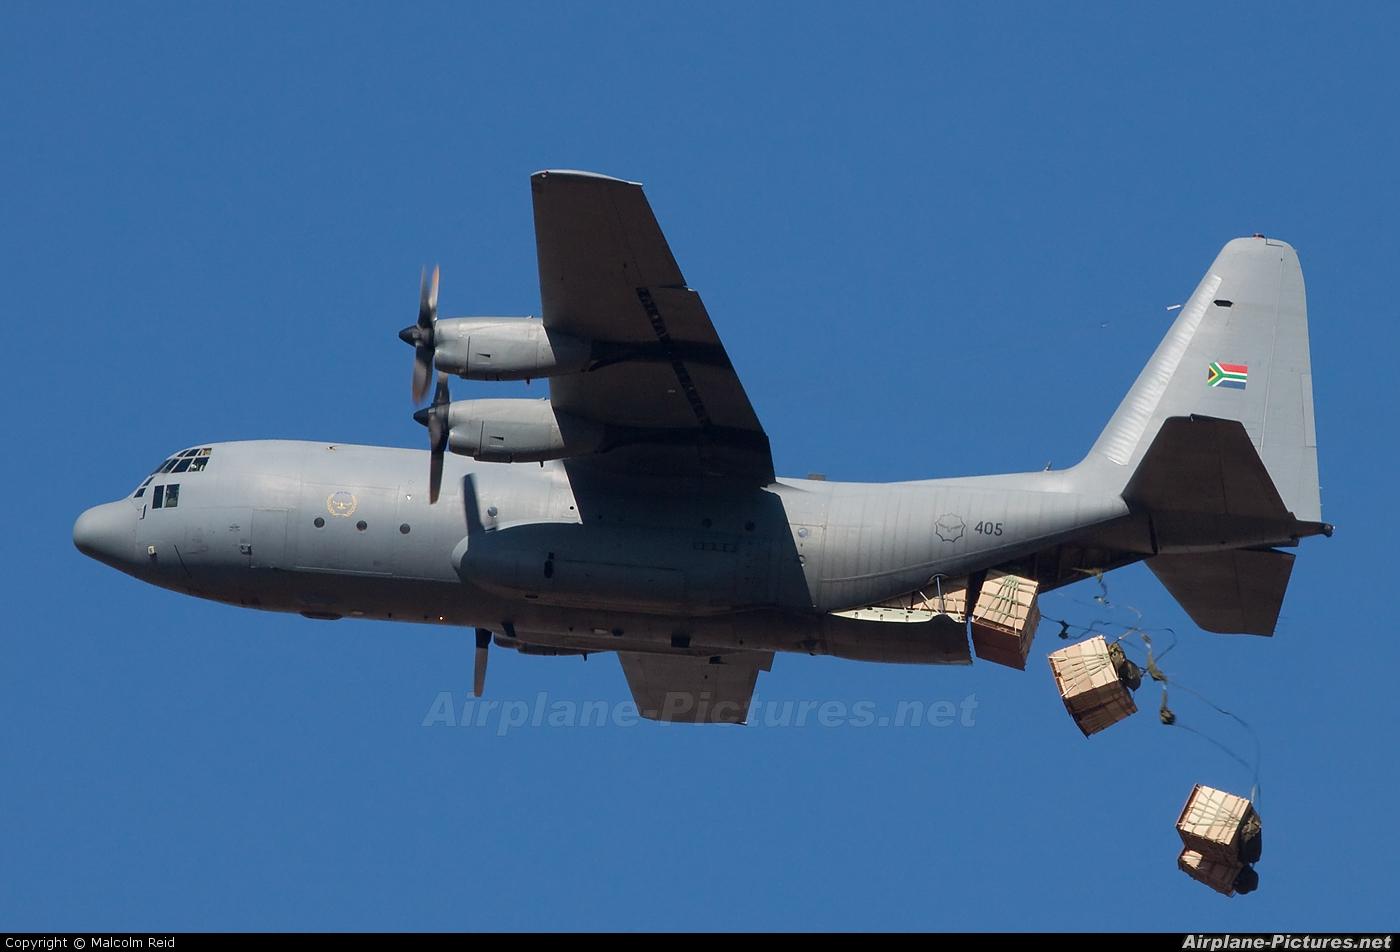 South Africa - Air Force 405 aircraft at Swartkops